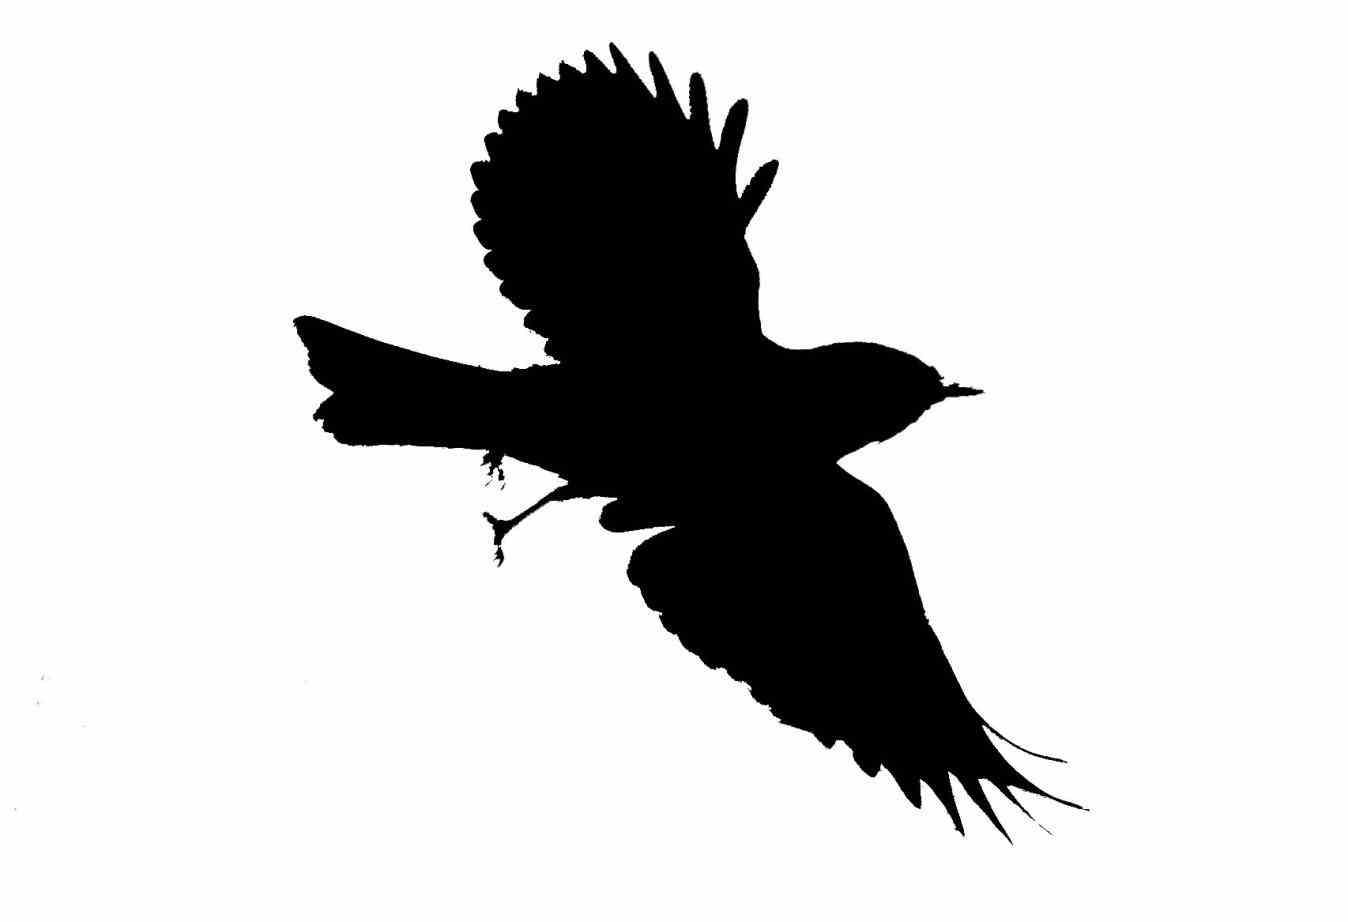 flying bird silhouette.